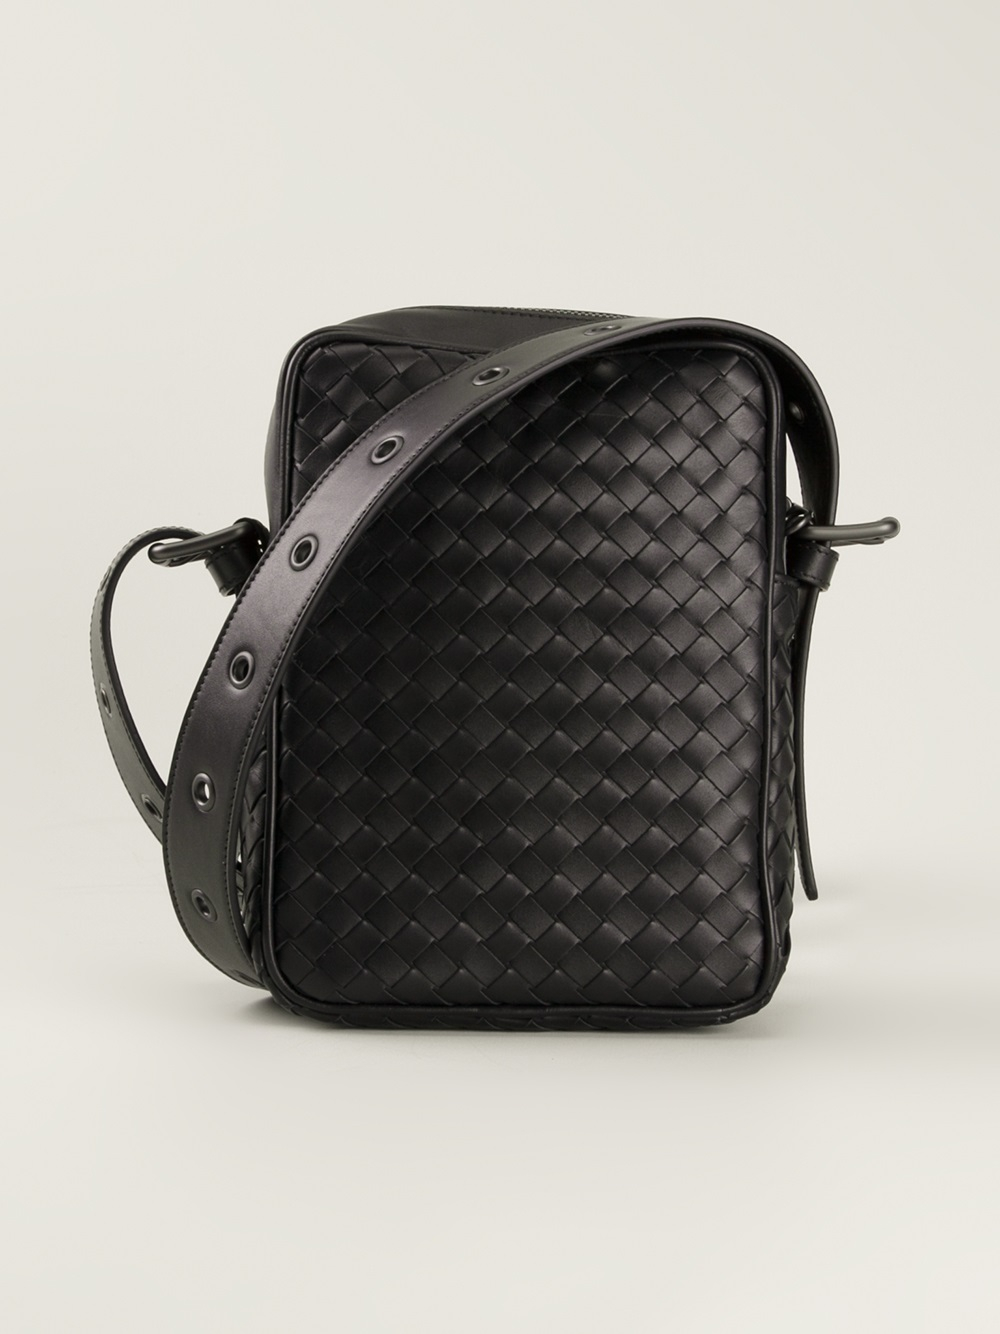 Bottega Veneta Small Woven Leather Messenger Bag